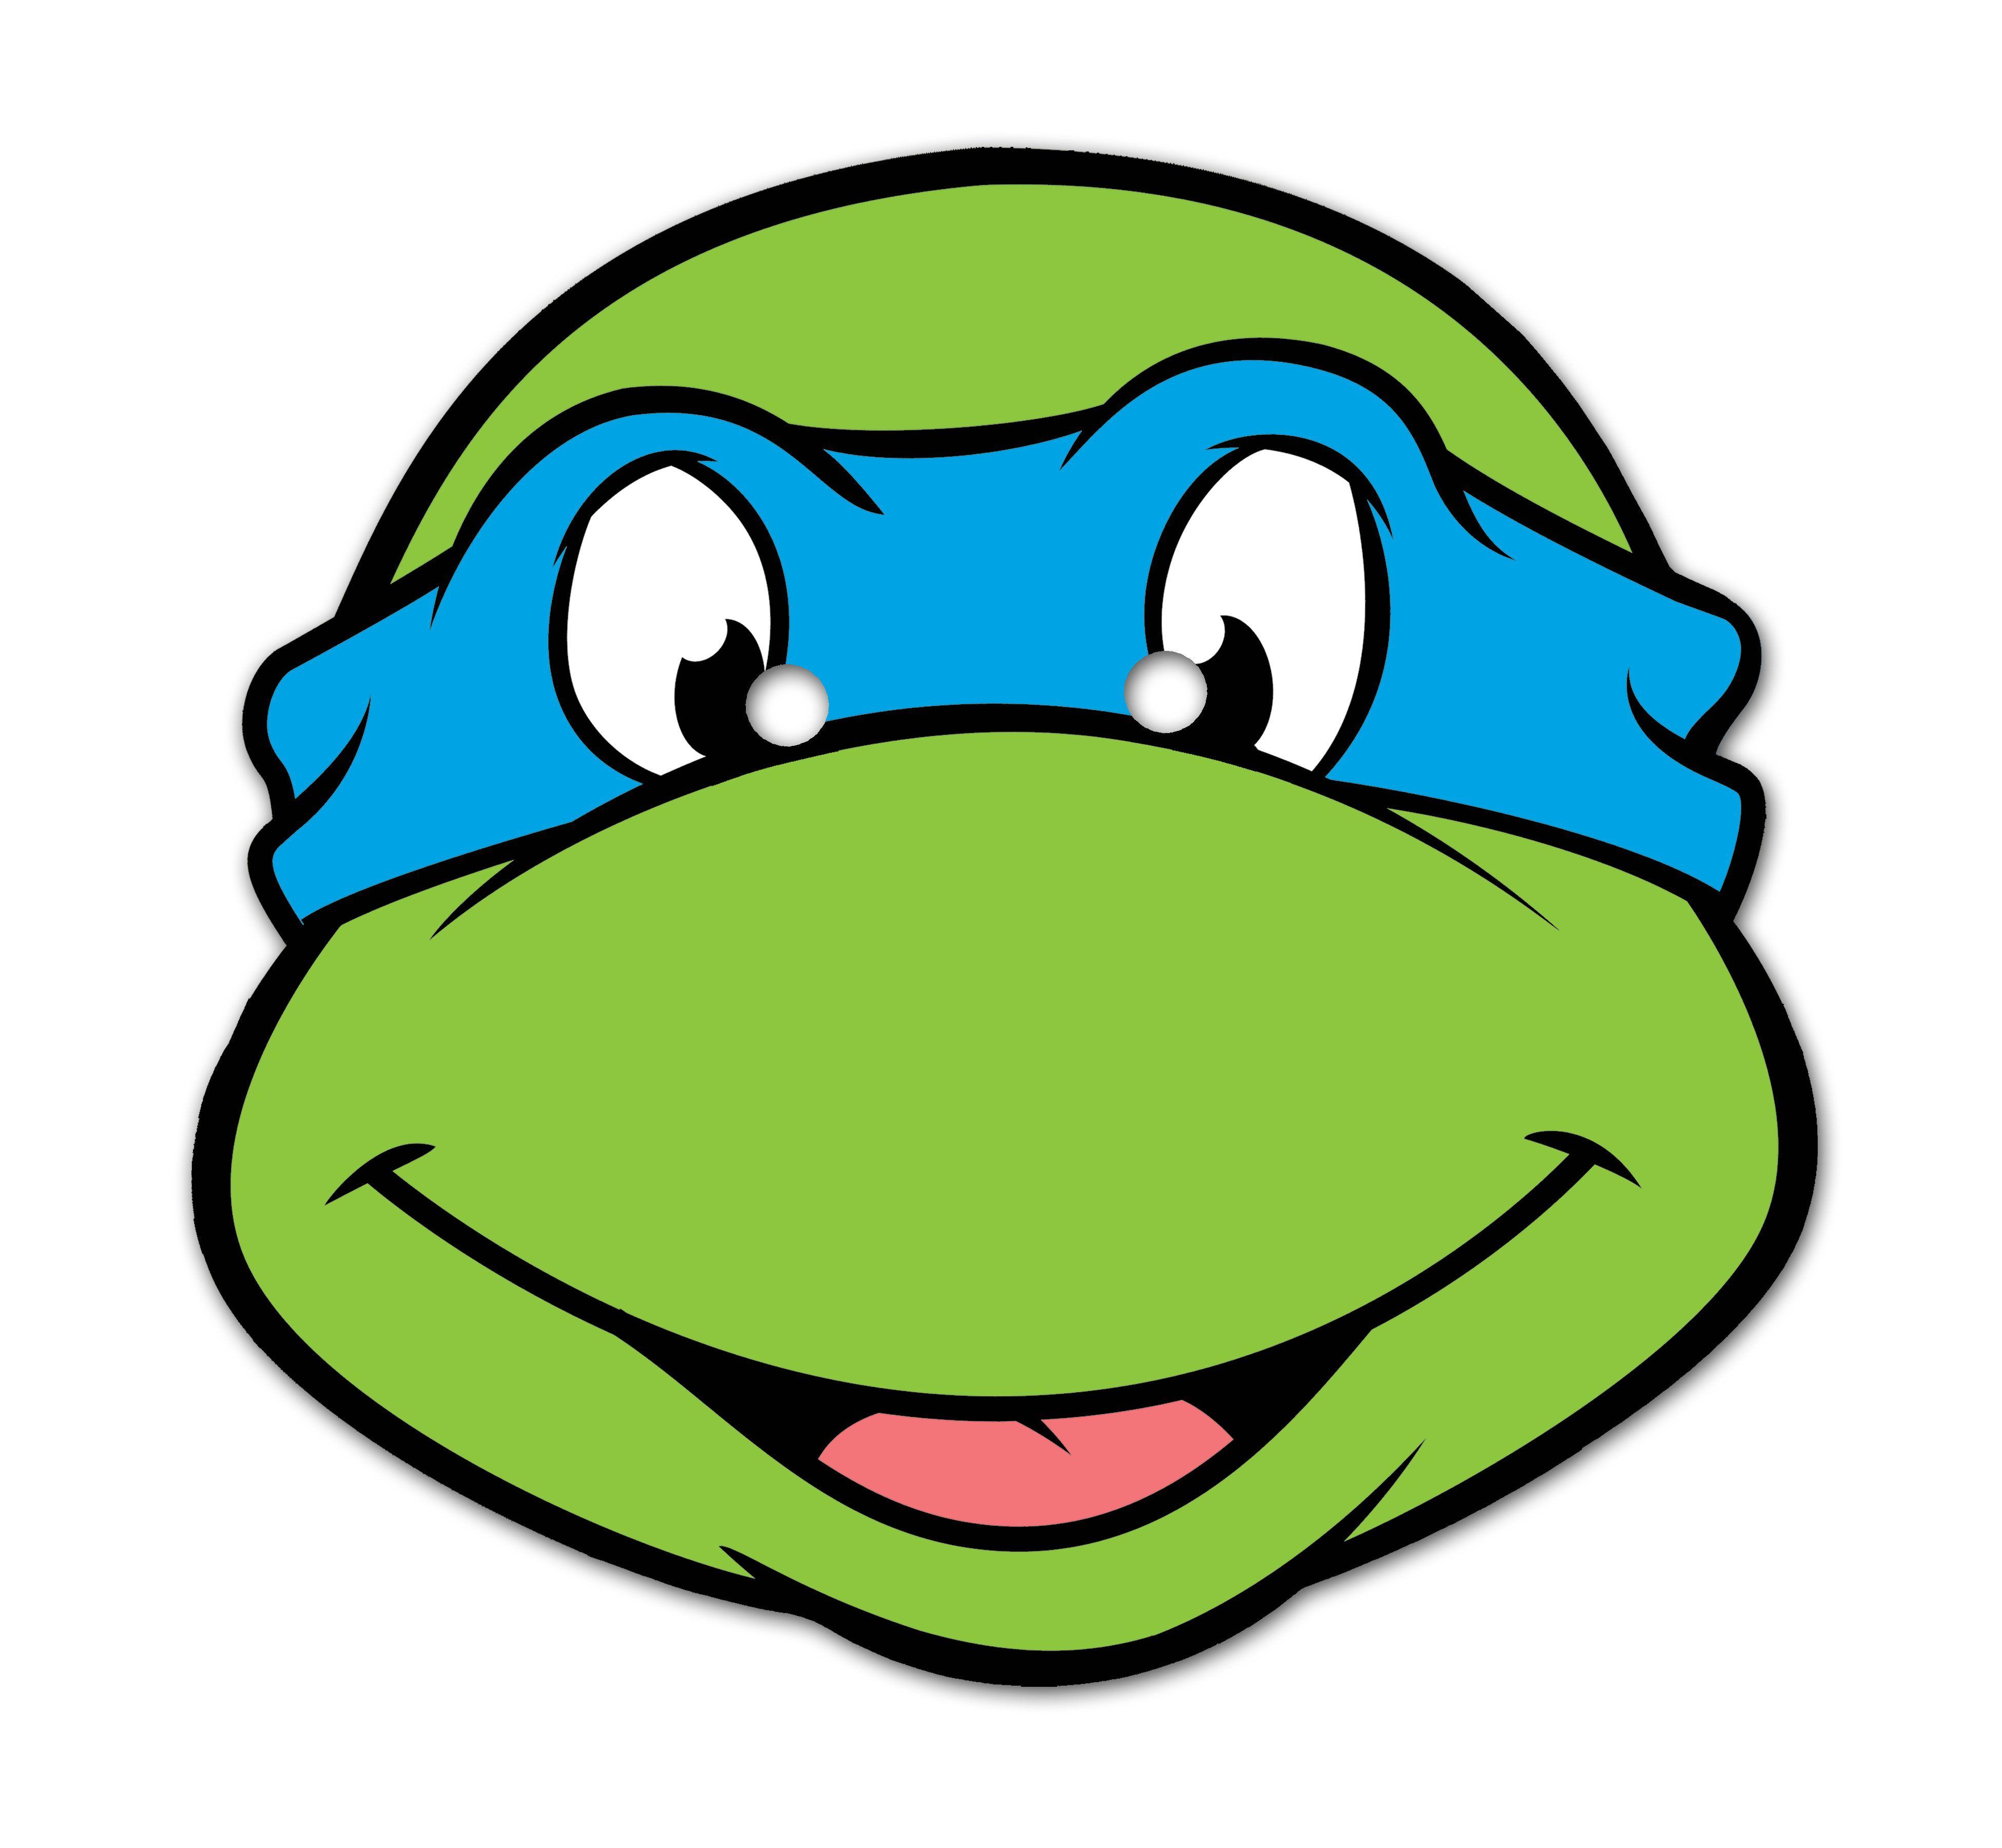 michelangelo ninja turtle face leonardo face ninja turtle rh pinterest com ninja turtle clipart free ninja turtle clipart head vector